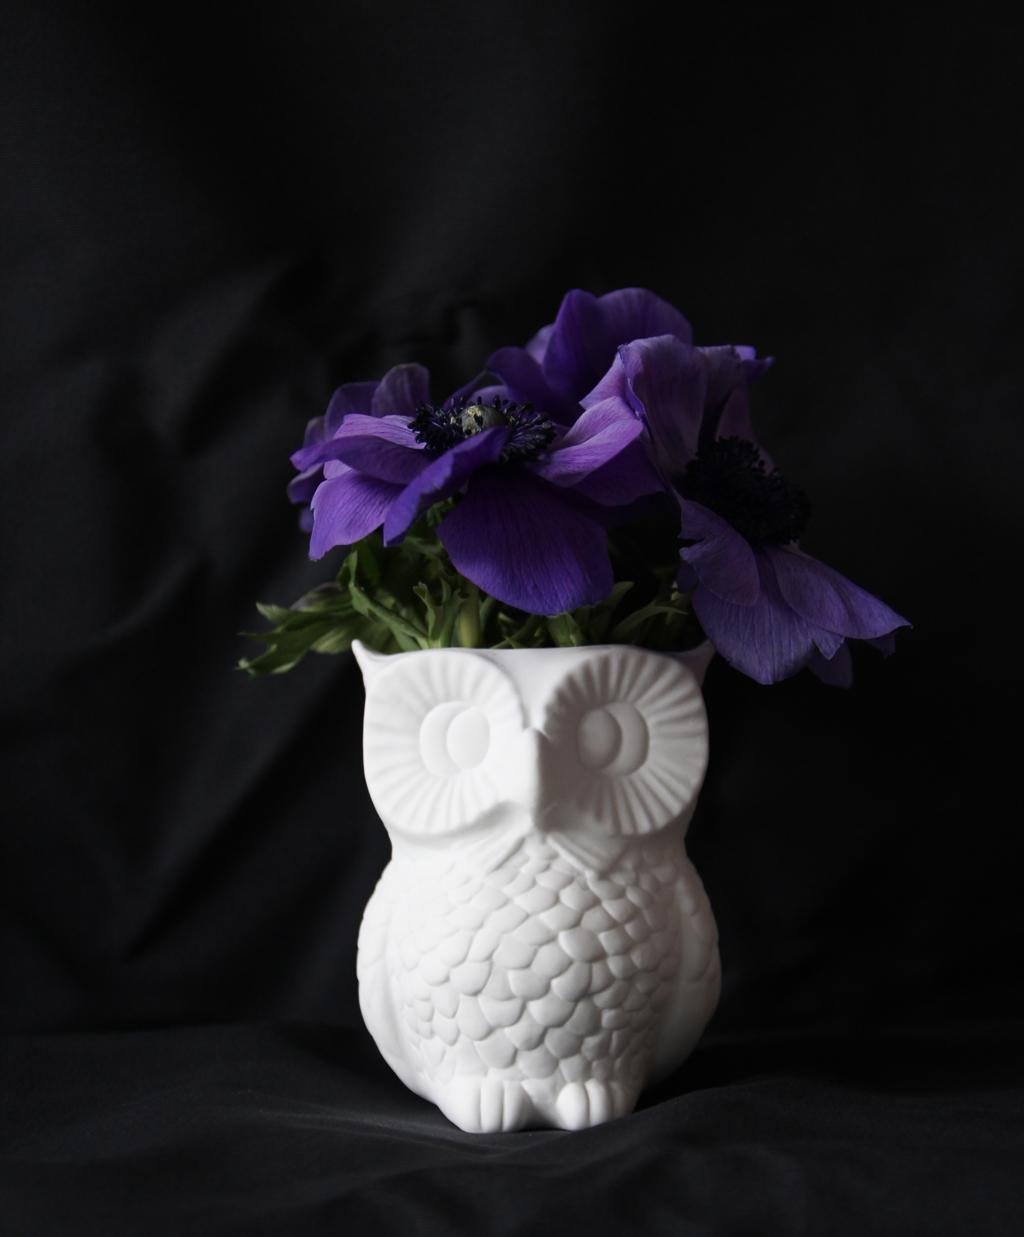 owl on a dark fabric